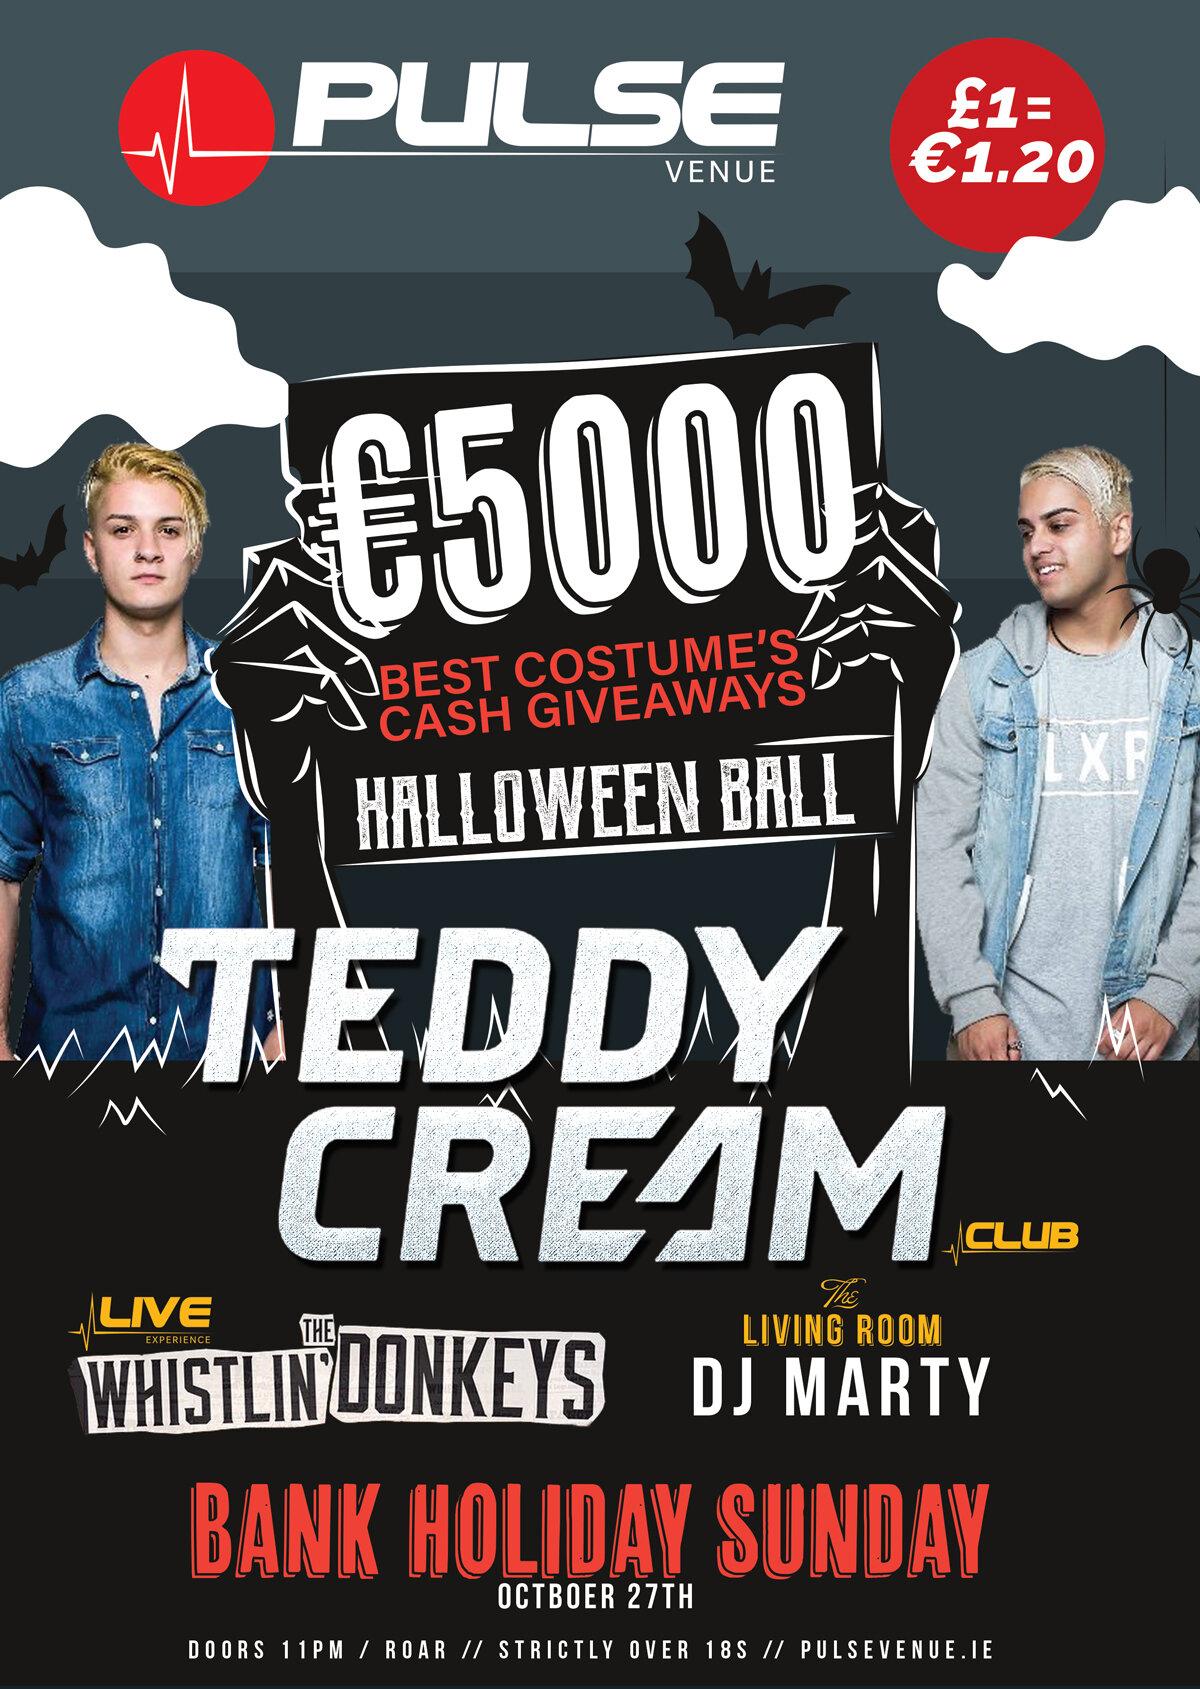 pulse-venue---halloween-ball---5000-giveaway-bank-holiday-sun-oct-27-2019.jpg